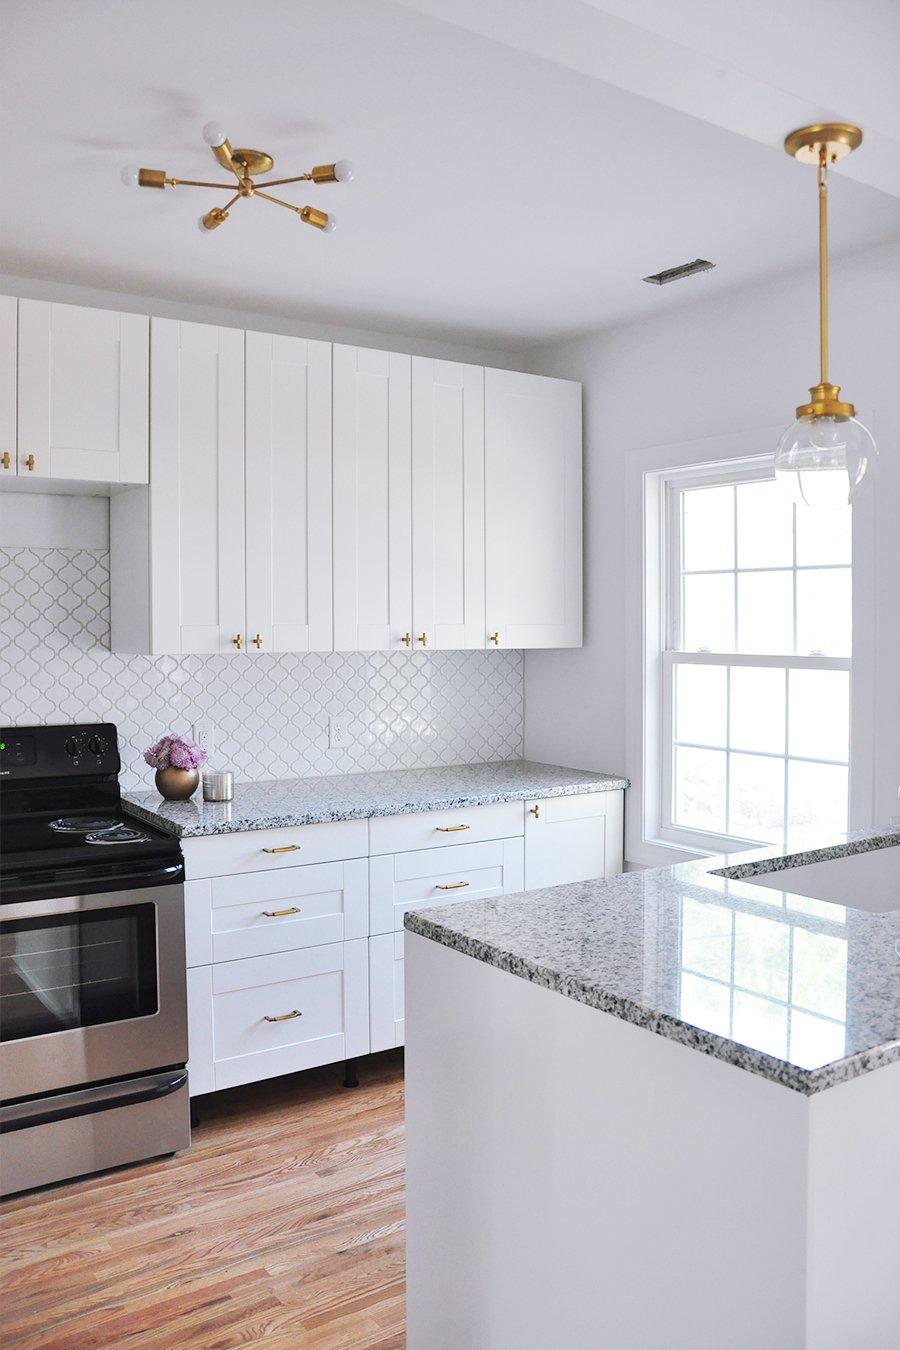 home-renovation-progress-report-kitchen-updates-11